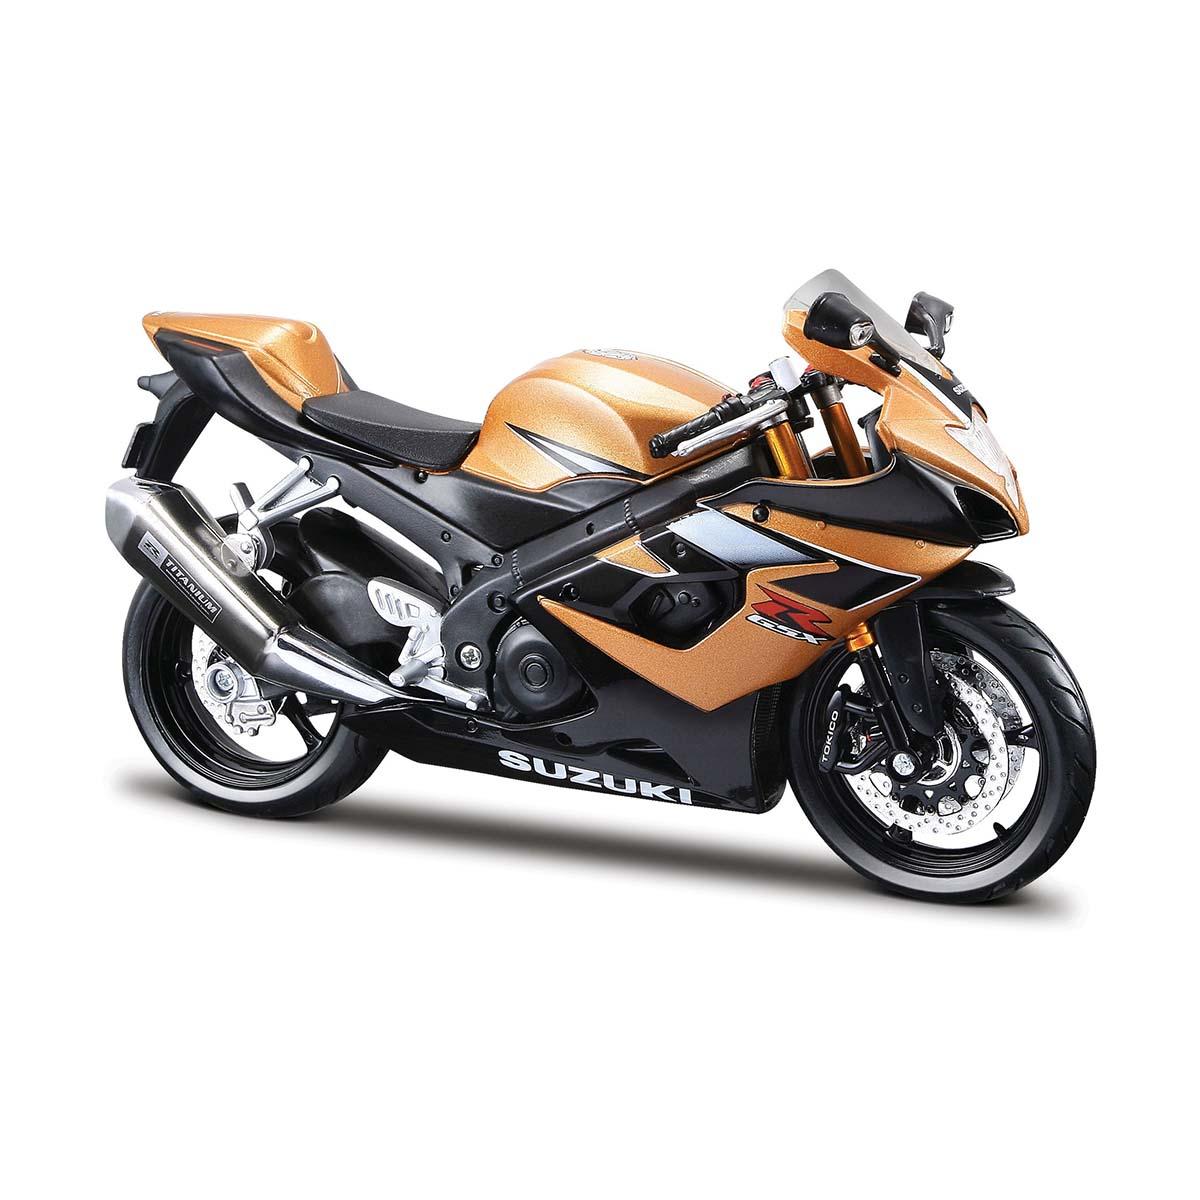 Motocicleta Maisto Suzuki GSX R1000, 1:12